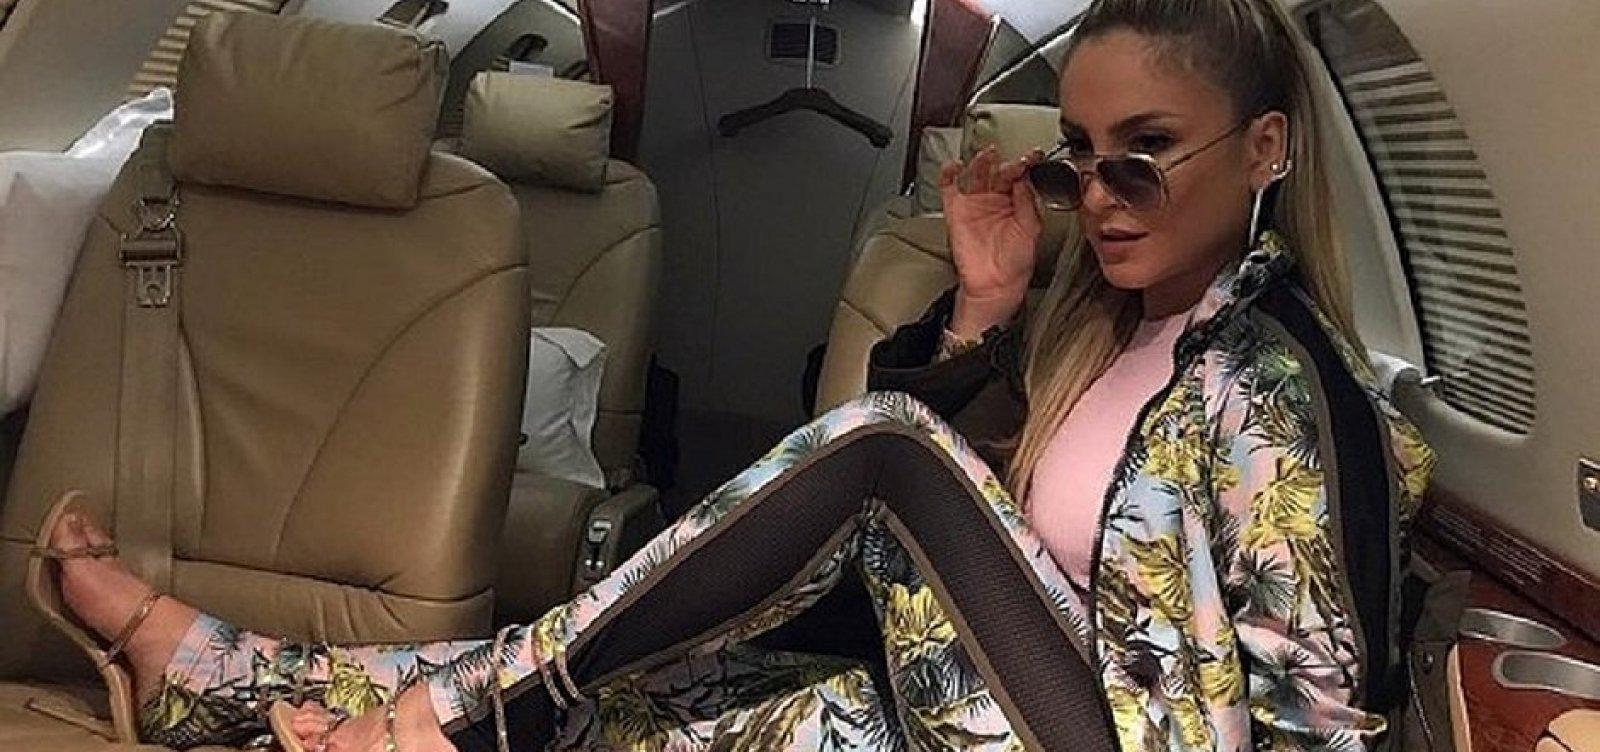 [Táxi-aéreo pirata que conduziria Claudia Leitte é interditado pela ANAC]